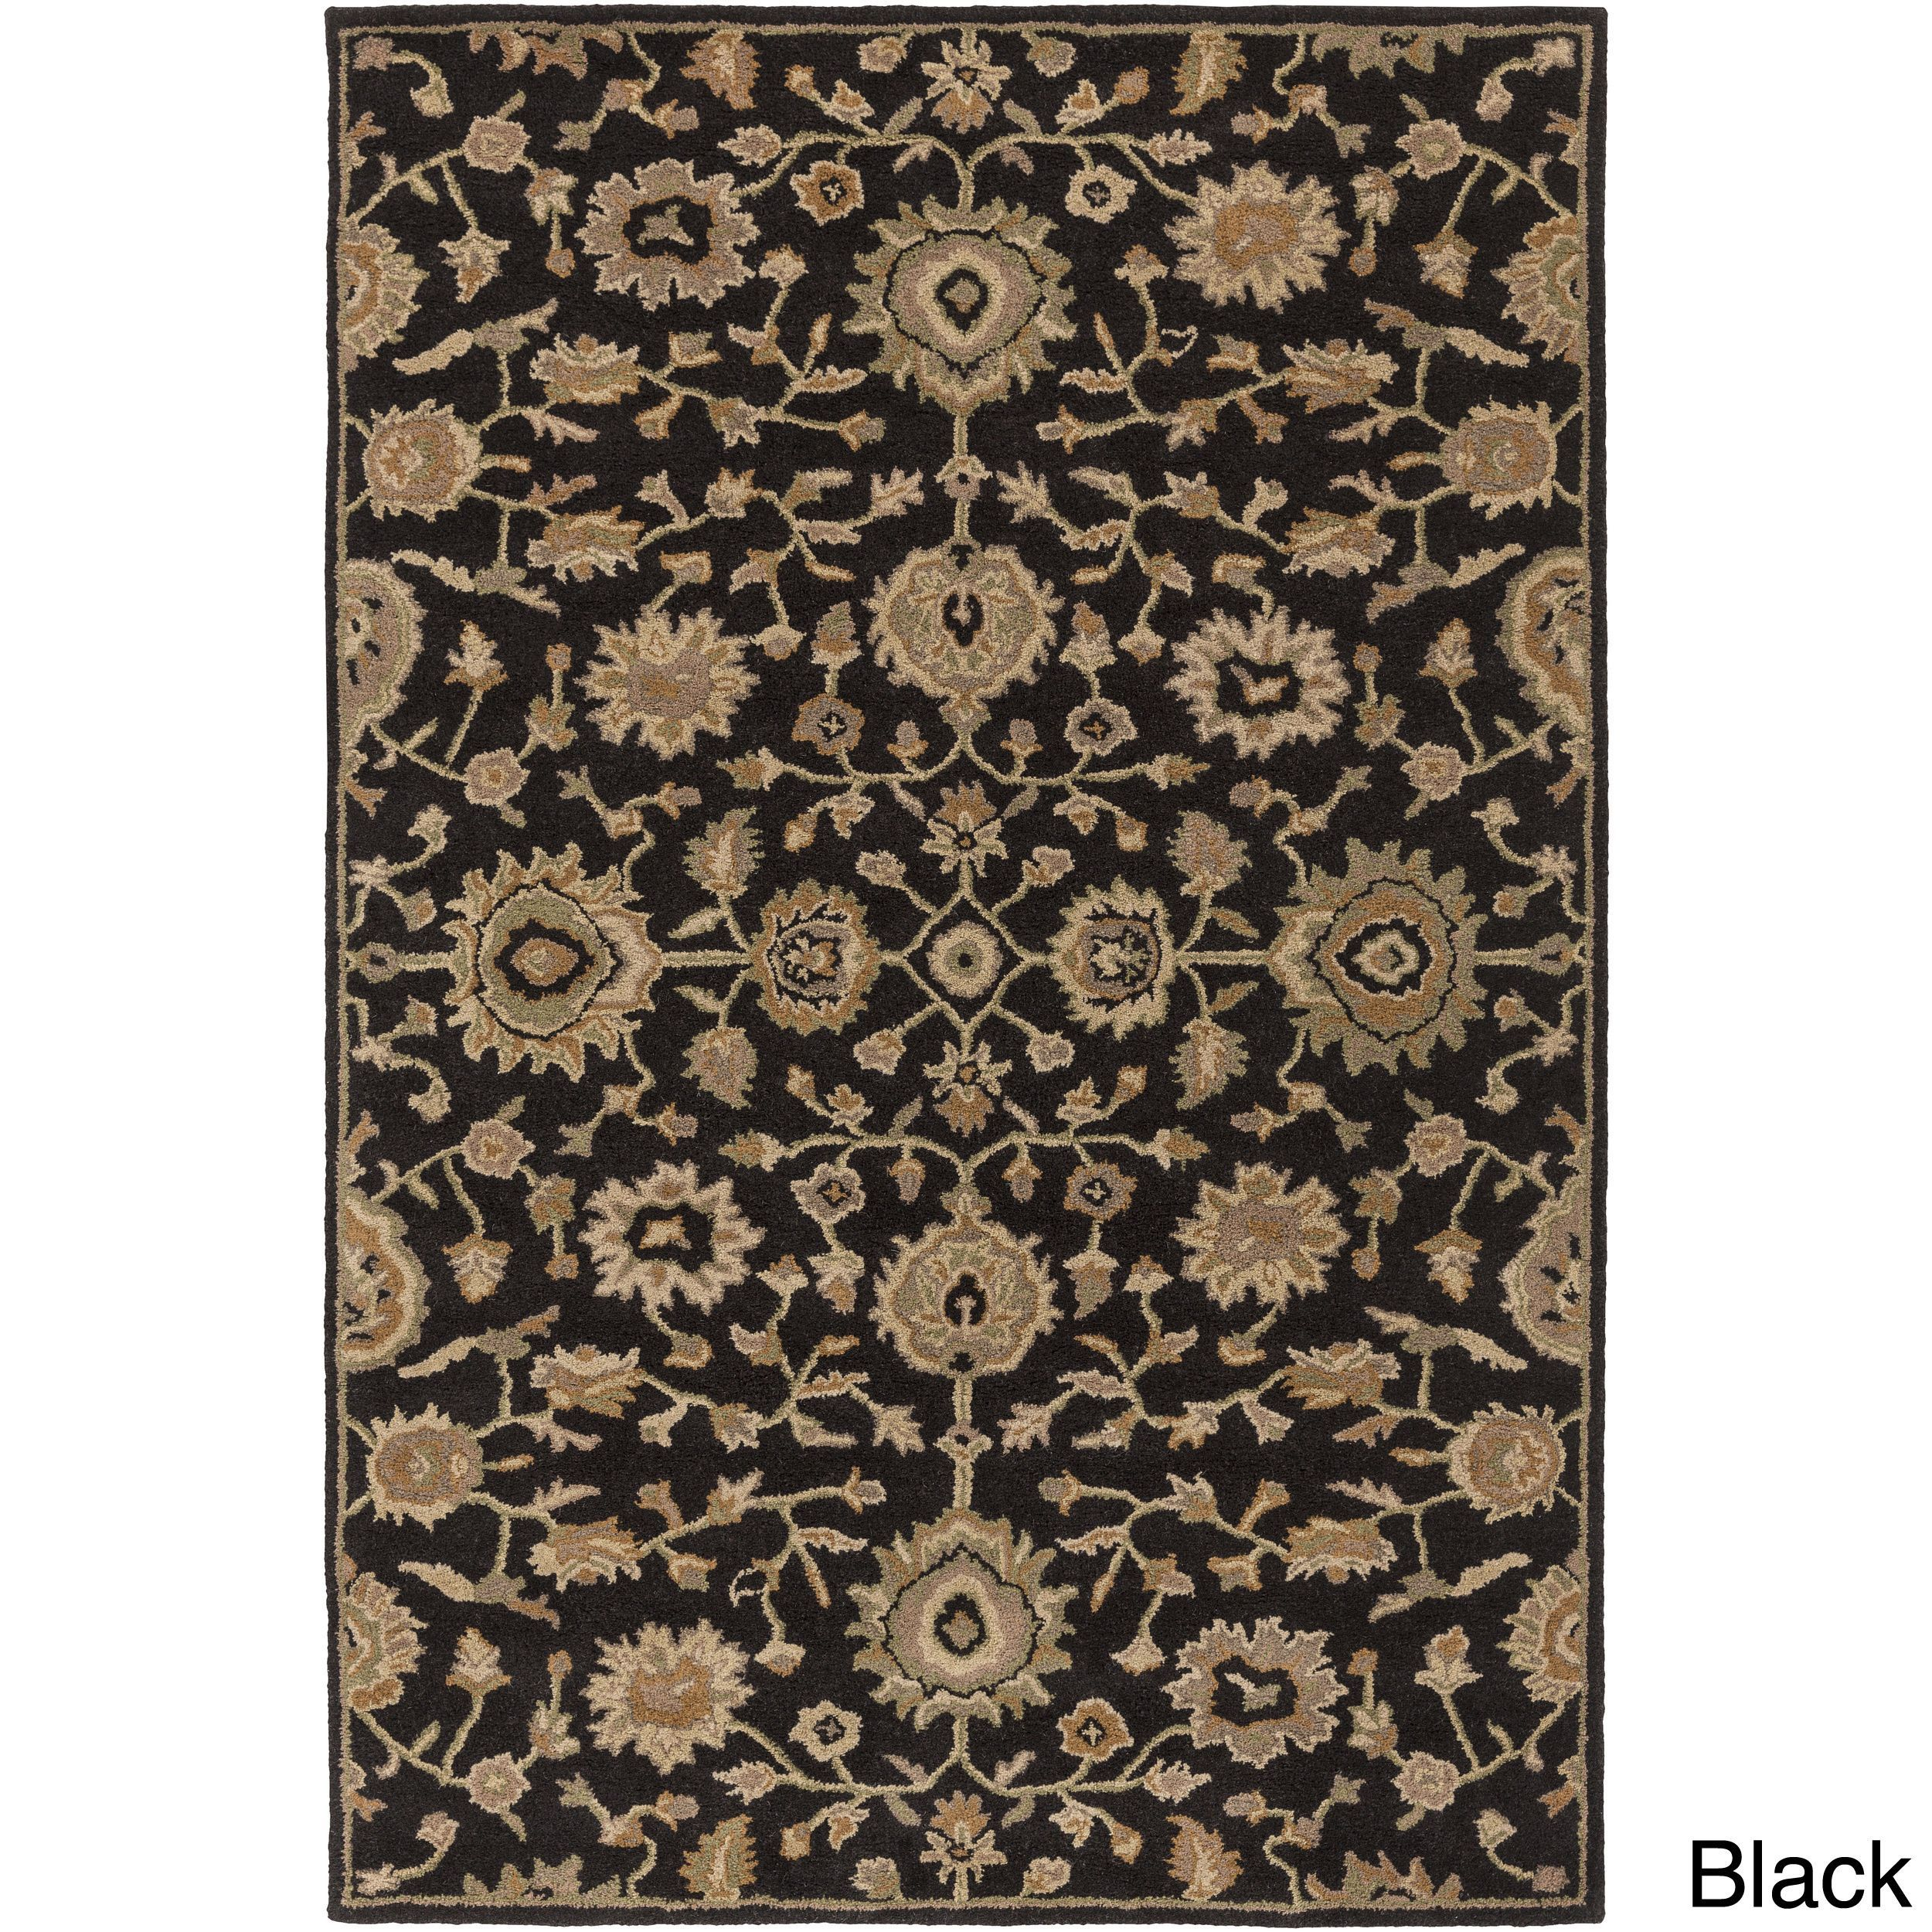 Surya Hand Tufted Calne Floral Wool Rug 7 6 X 9 6 Black 7 6 X 9